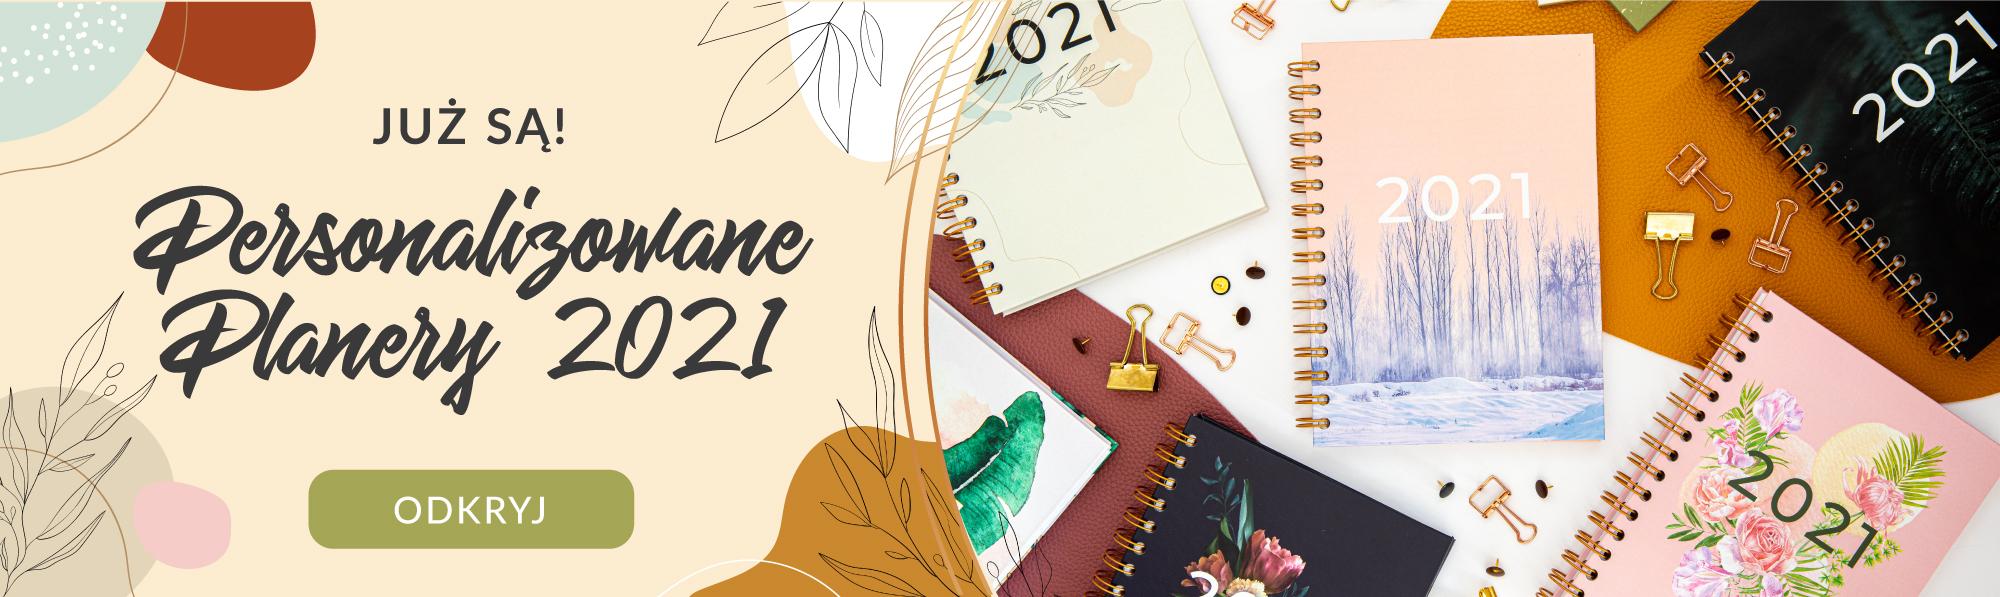 Baner Planery 2021 sprzedaz regularna